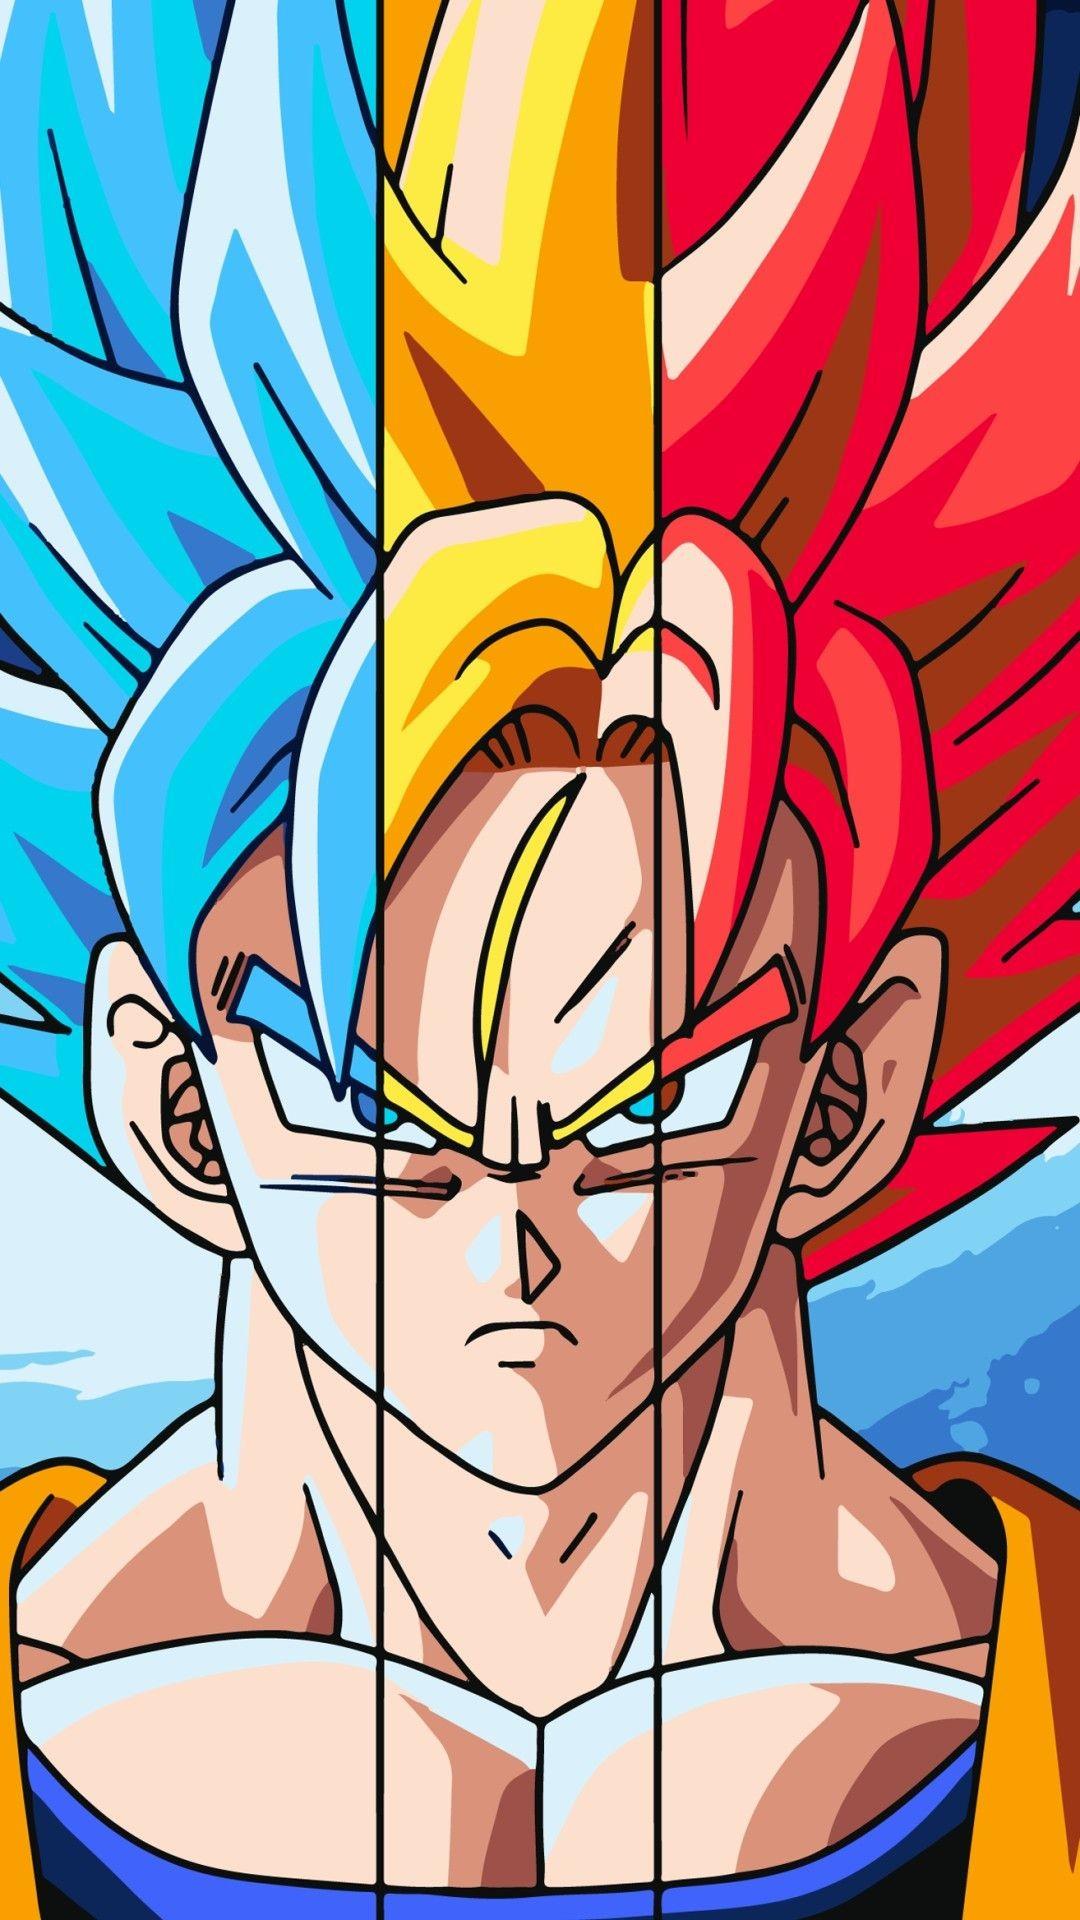 Res: 1080x1920, Goku Iphone Wallpaper 2018 is high definition wallpaper.